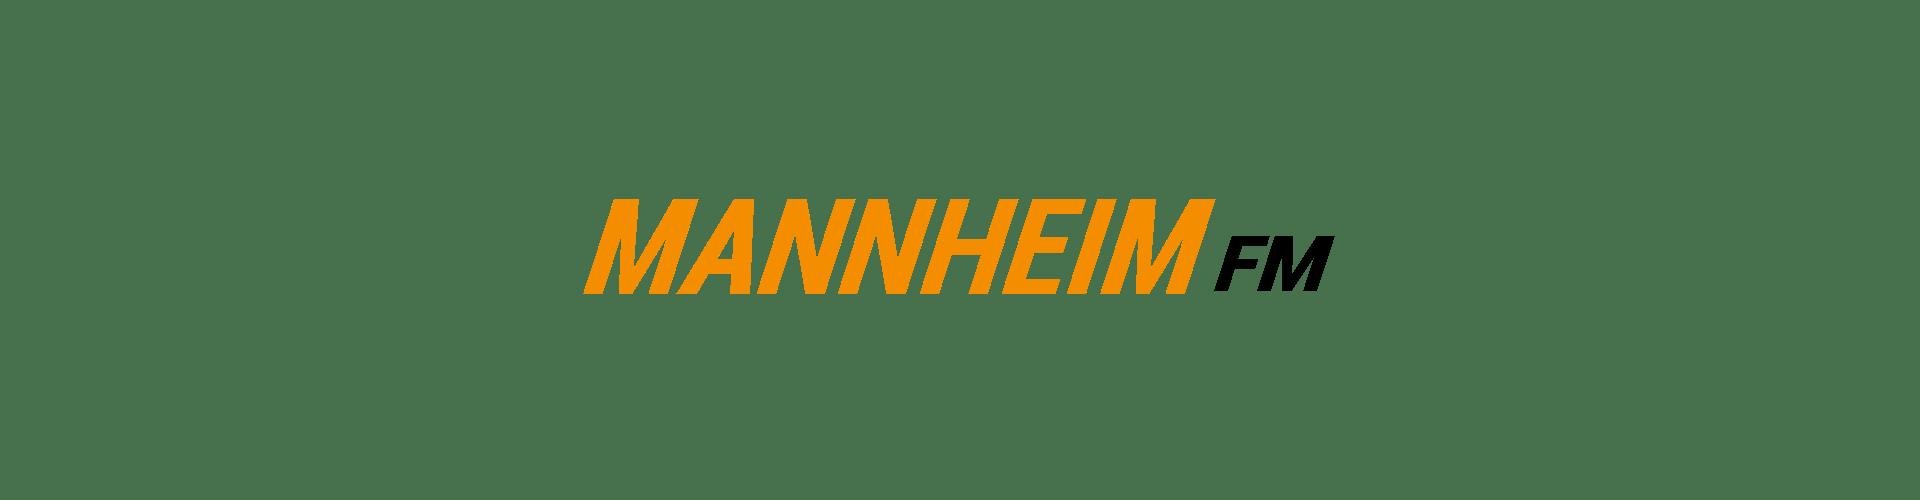 Mannheim FM